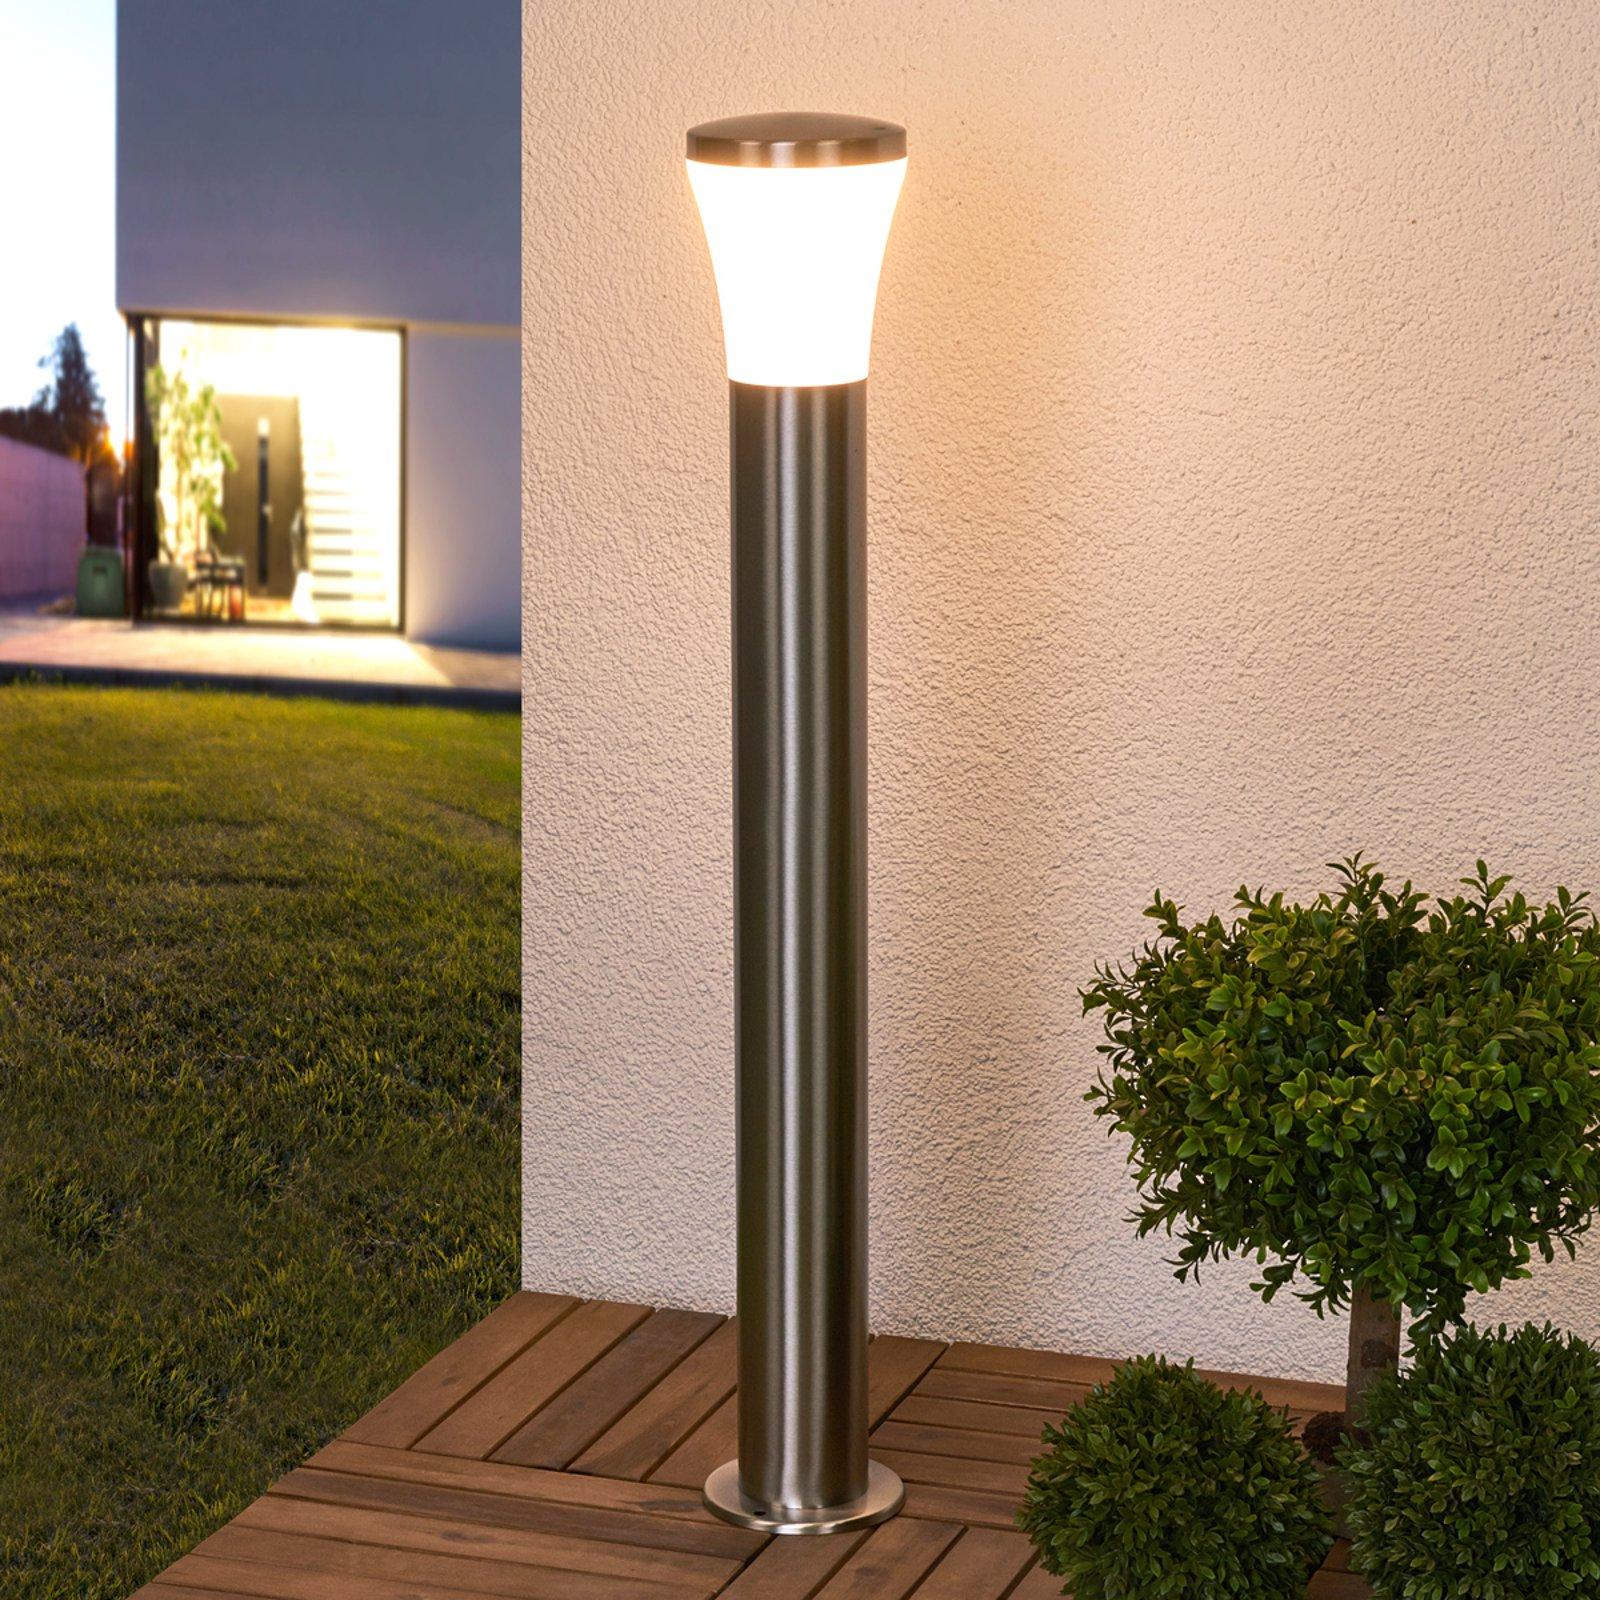 Edelstål-LED-veilampe Sumea